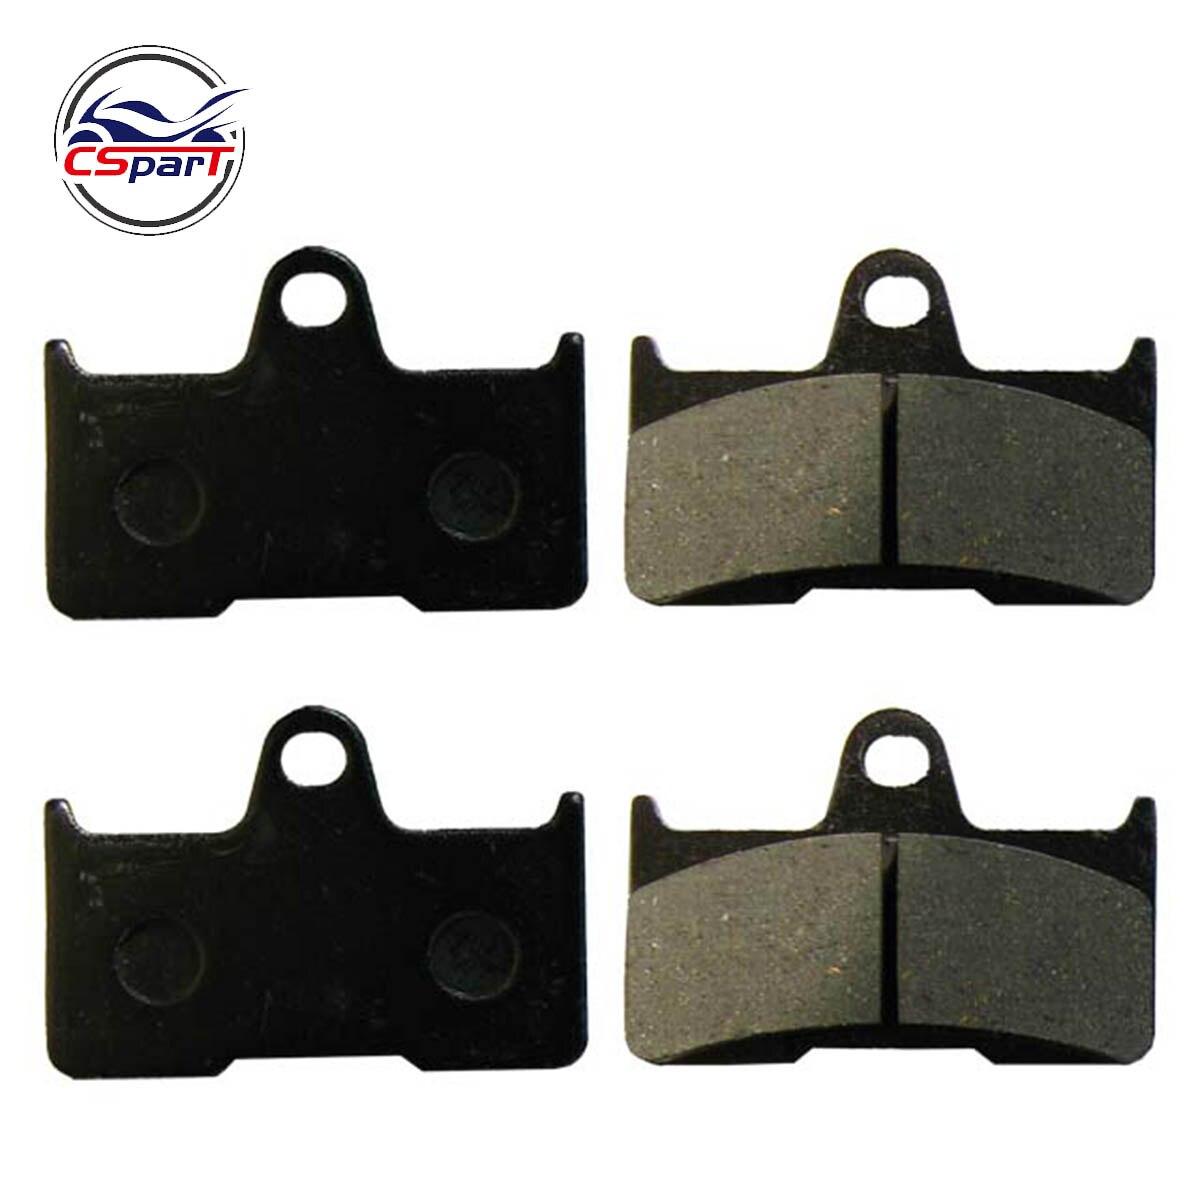 2 Sets Rear Brake Pad For CFORCE UFORCE CFMoto CF500 X5 X6 X8 U5 U6 450 550 600 800 500CC  600CC 800CC  ATV UTV 9010-080510